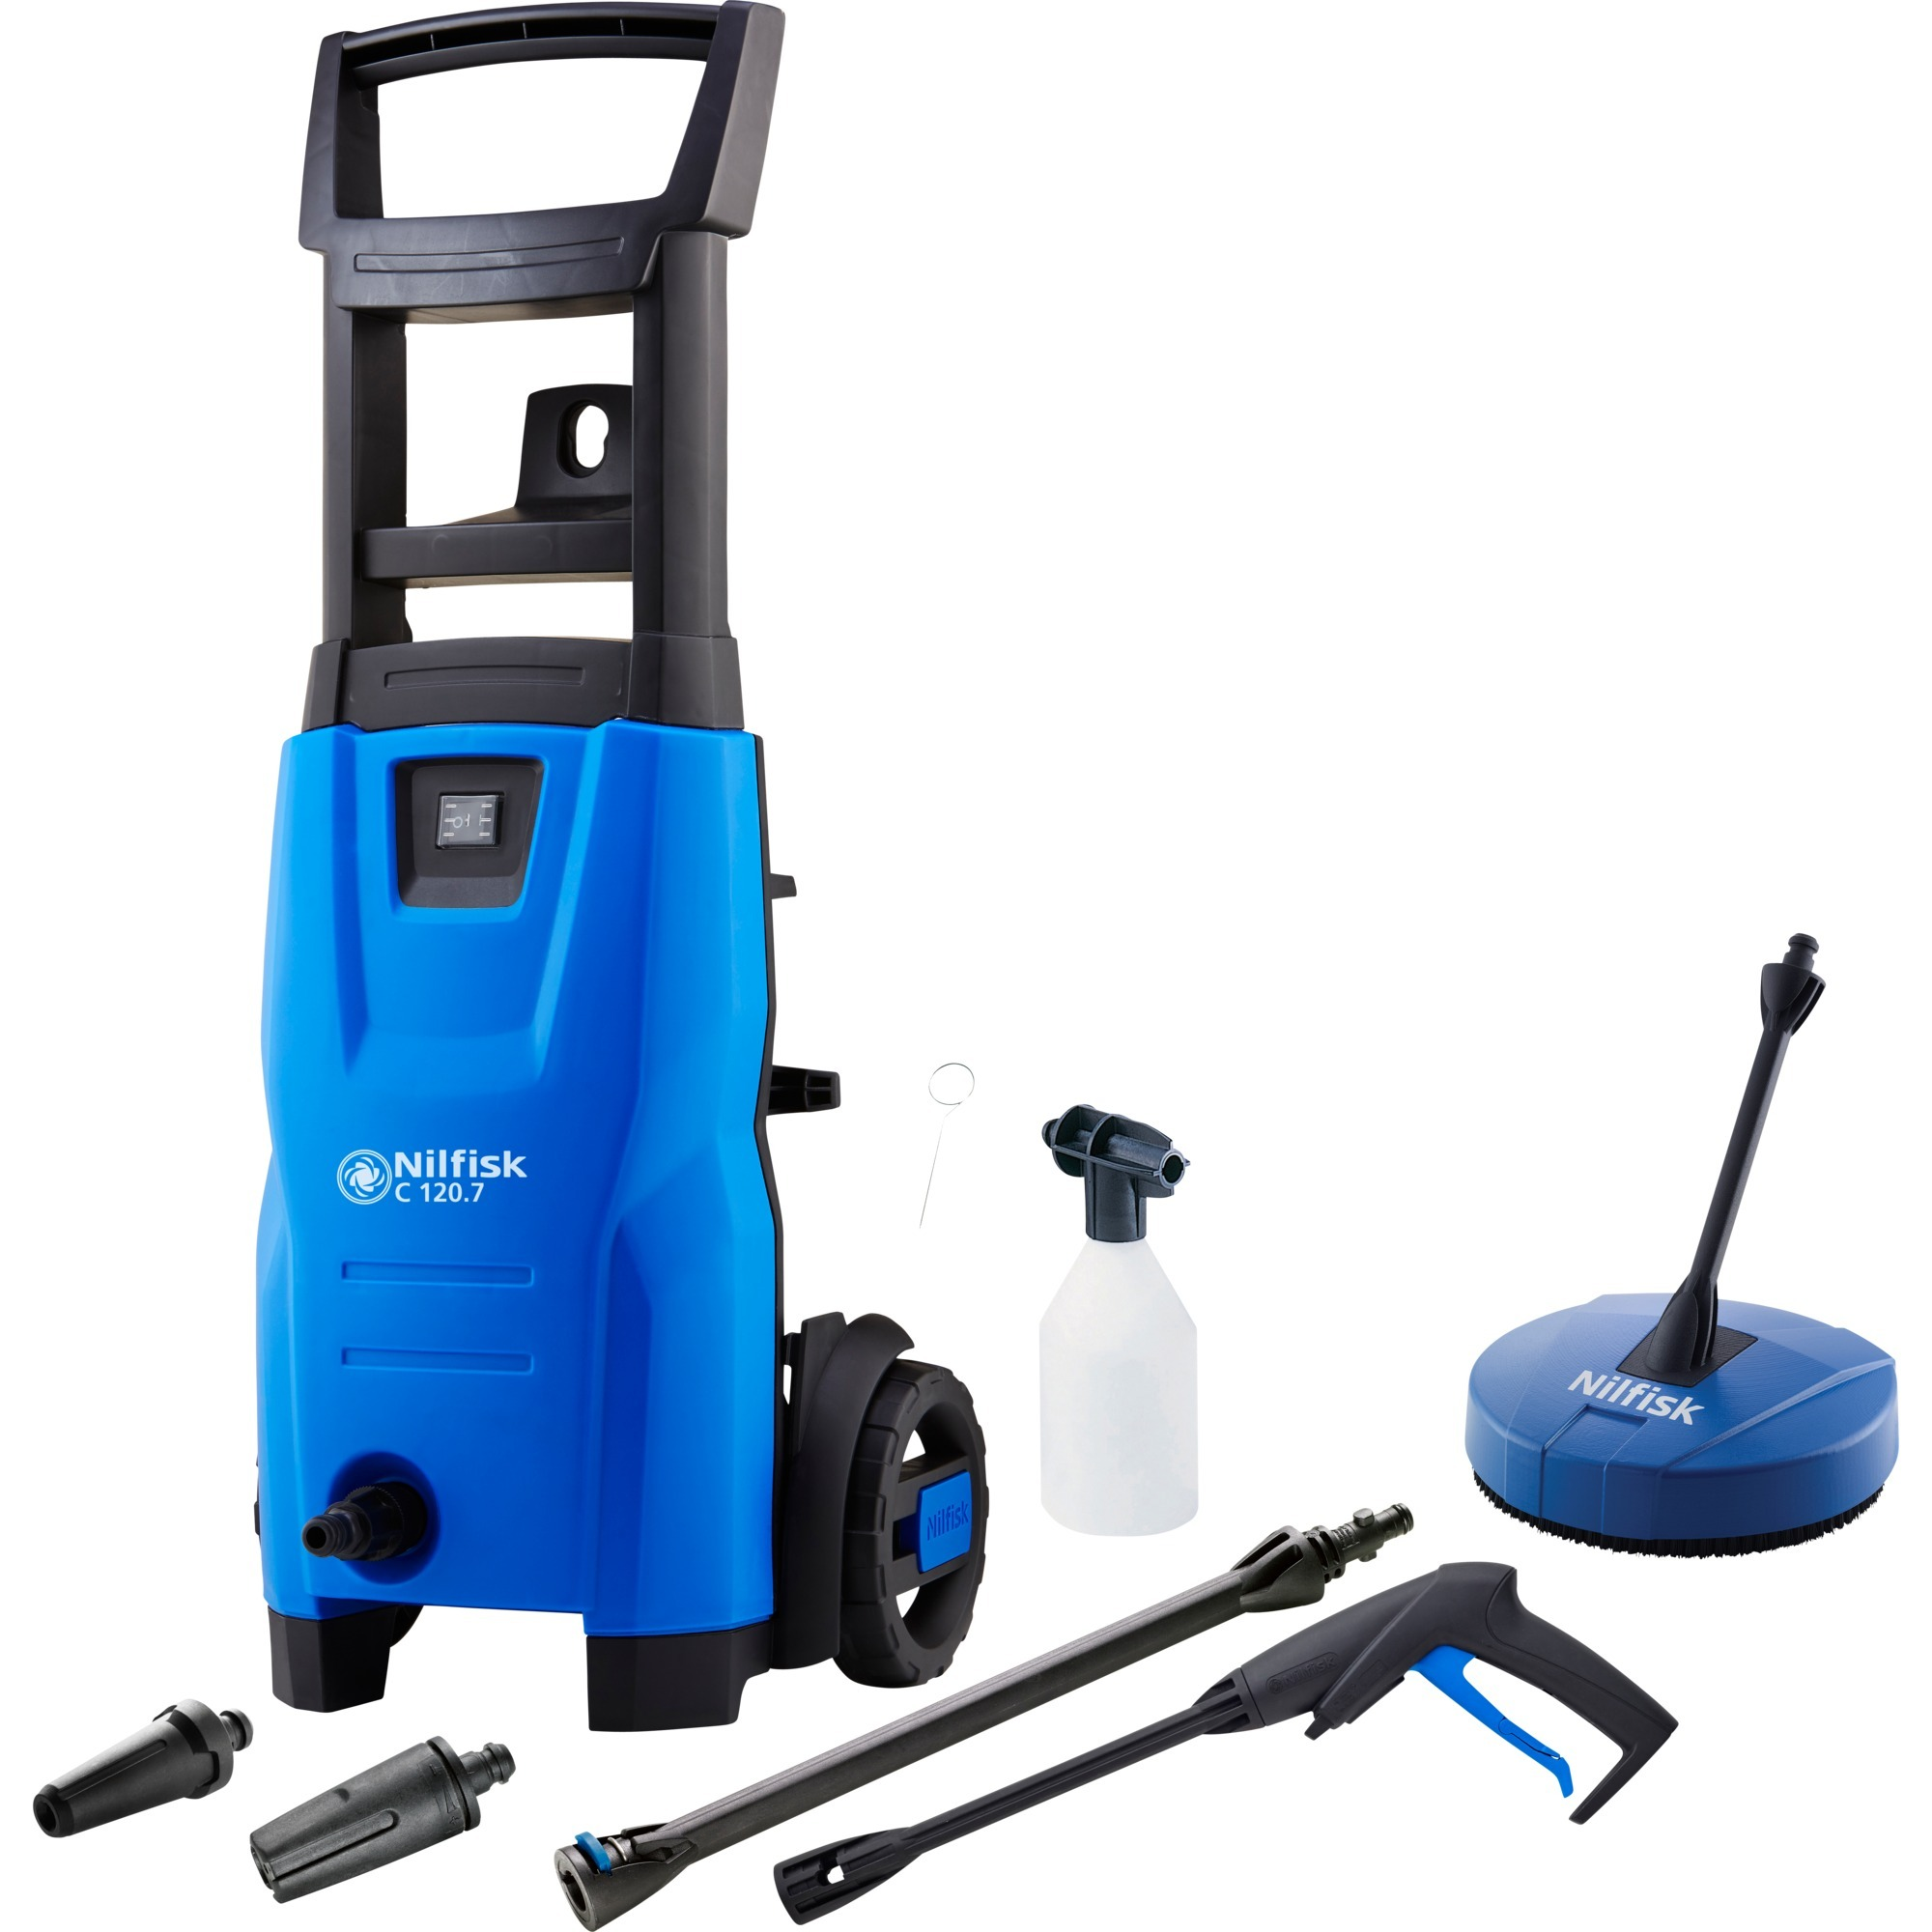 C 120.7-6 PC EU Limpiadora de alta presión o Hidrolimpiadora Vertical Eléctrico Negro, Azul 440 l/h 1400 W, Hidrolimpiadora de alta presión